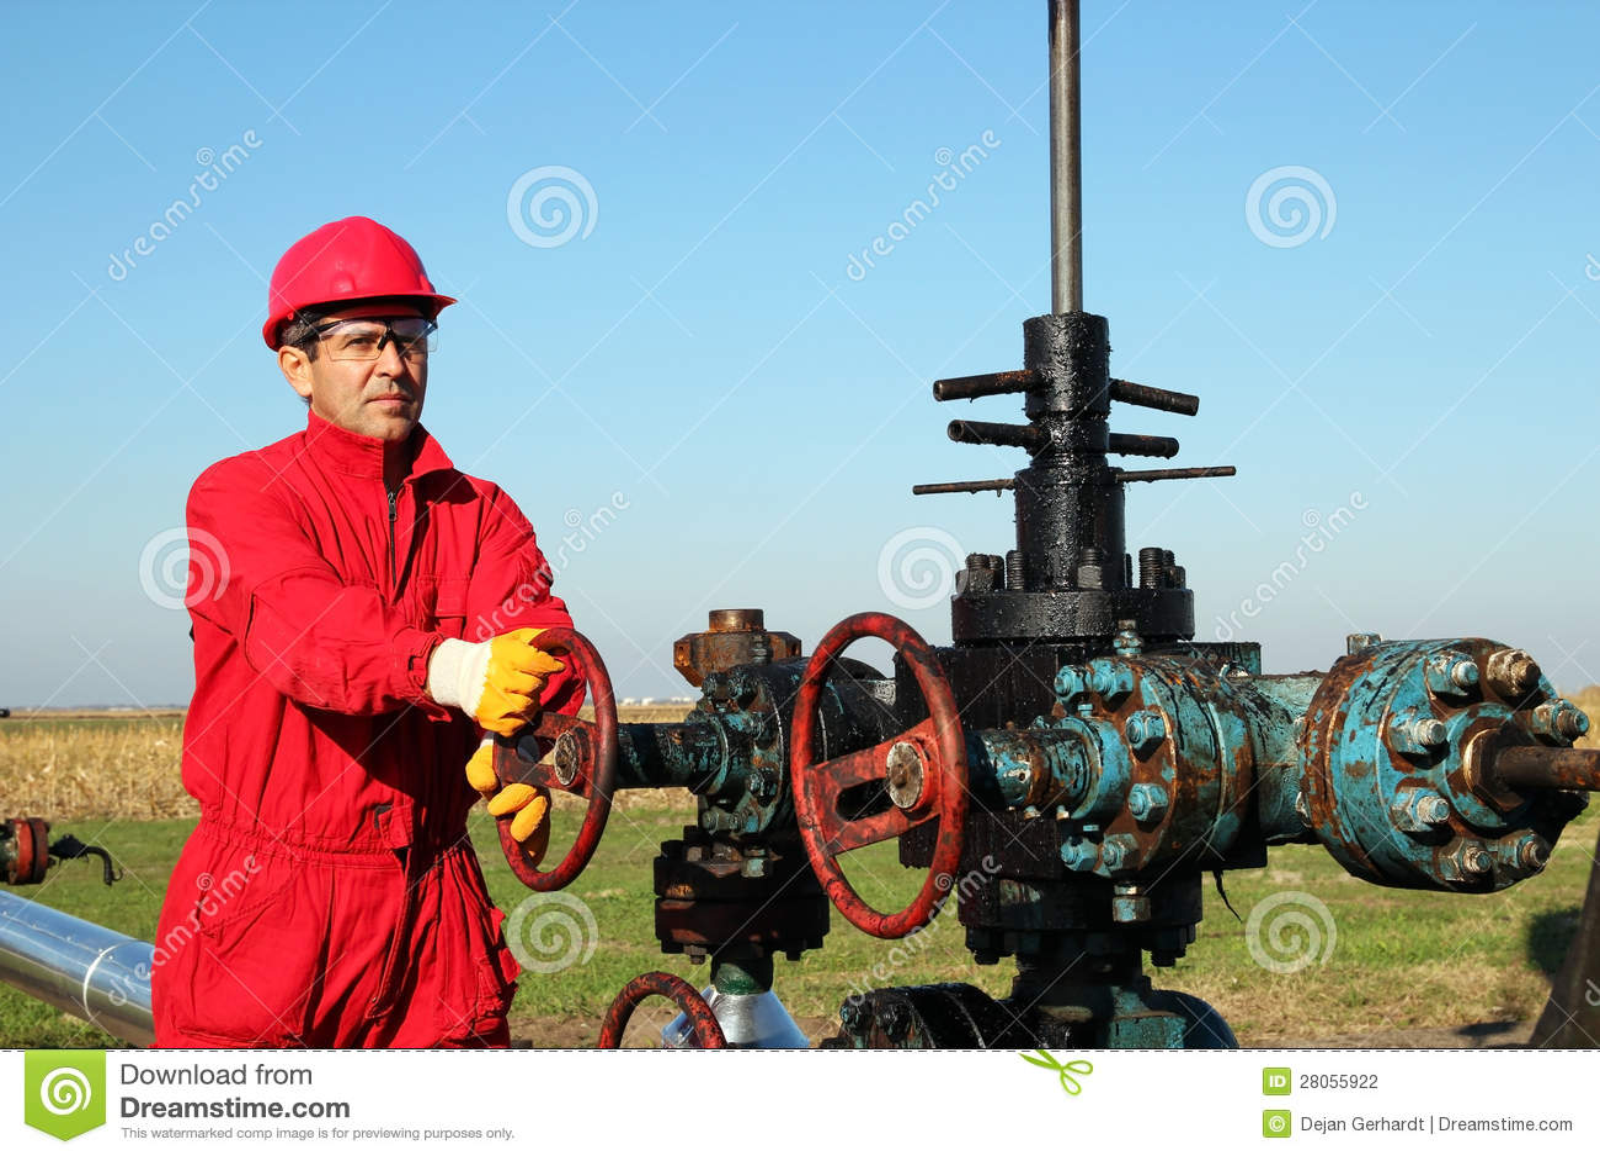 oil rig equipment field manual download